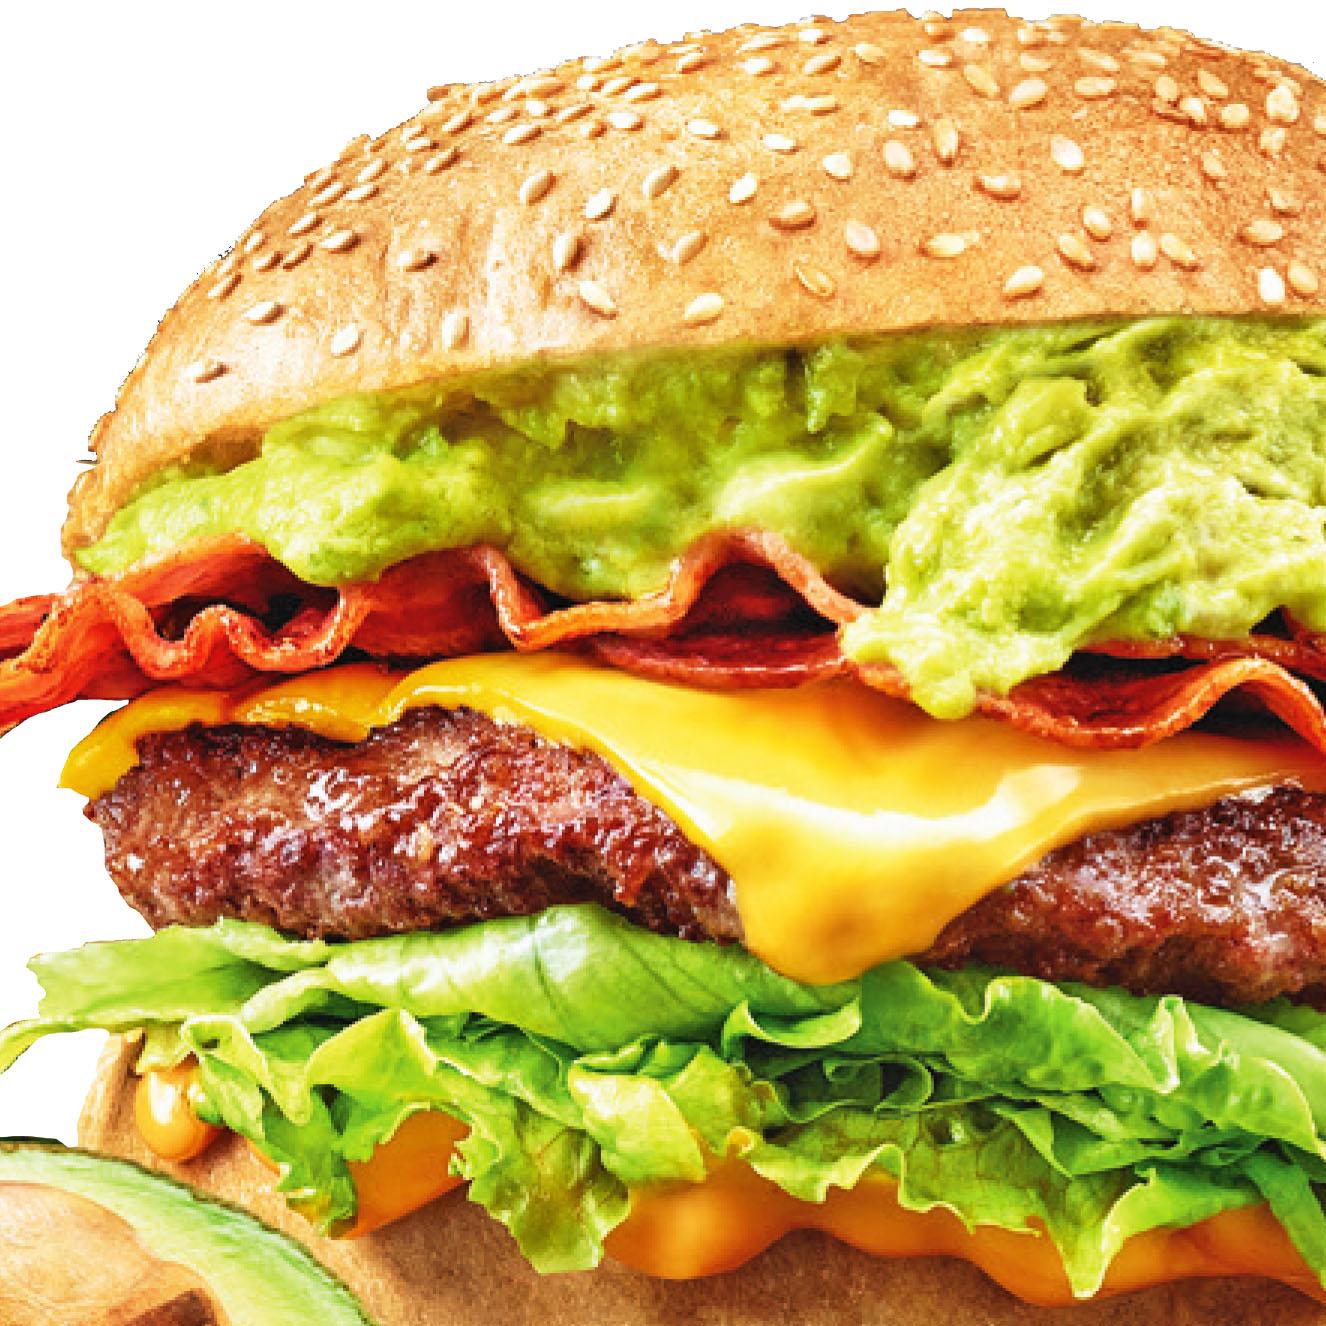 Burgerista, richtig gute Burger 50% billiger